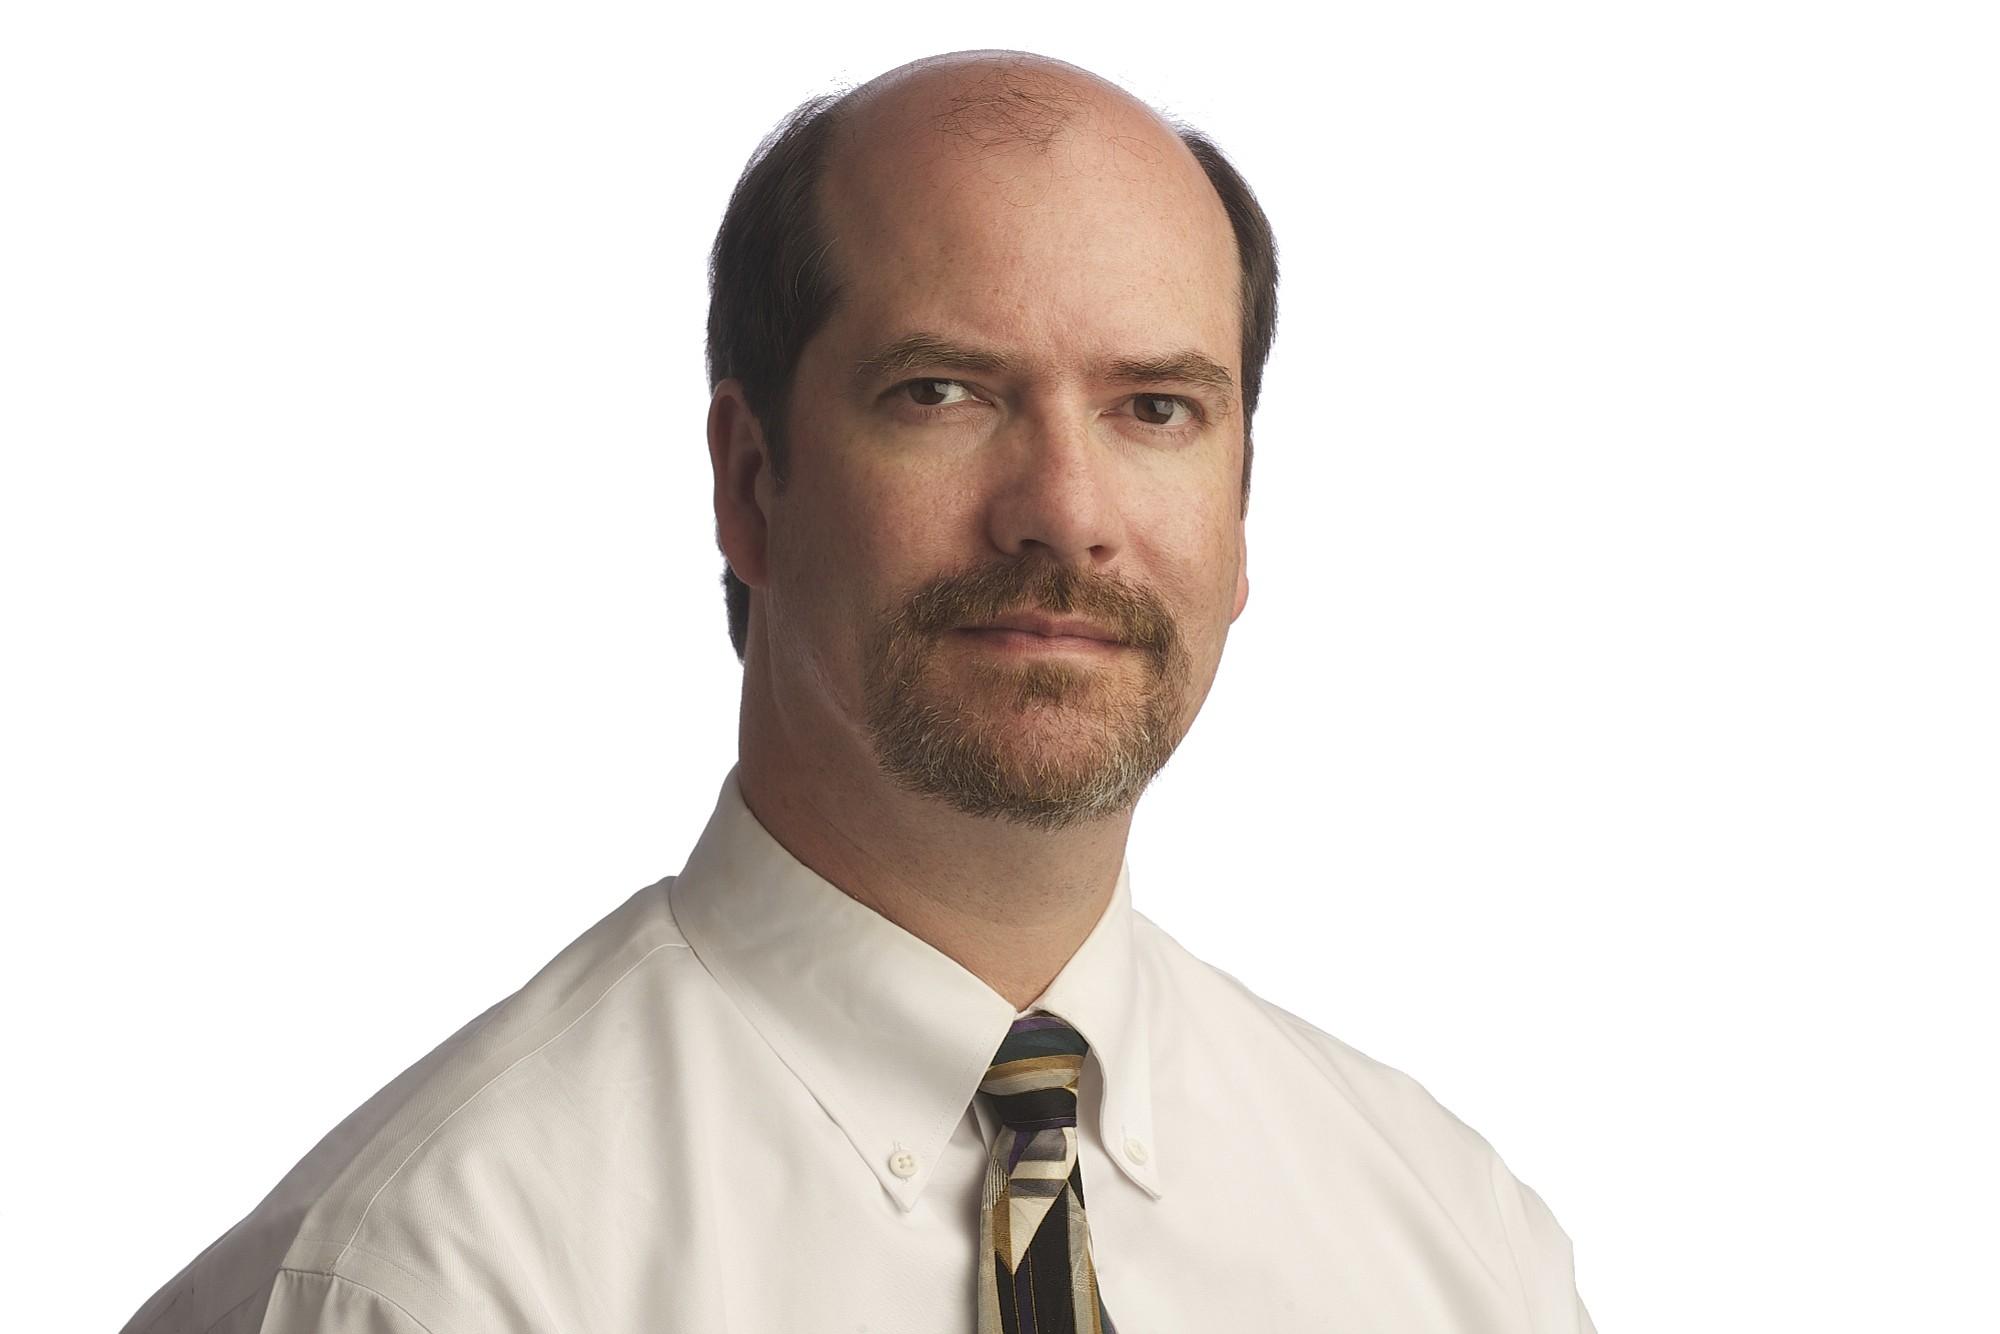 Greg Jayne, Opinion page editor